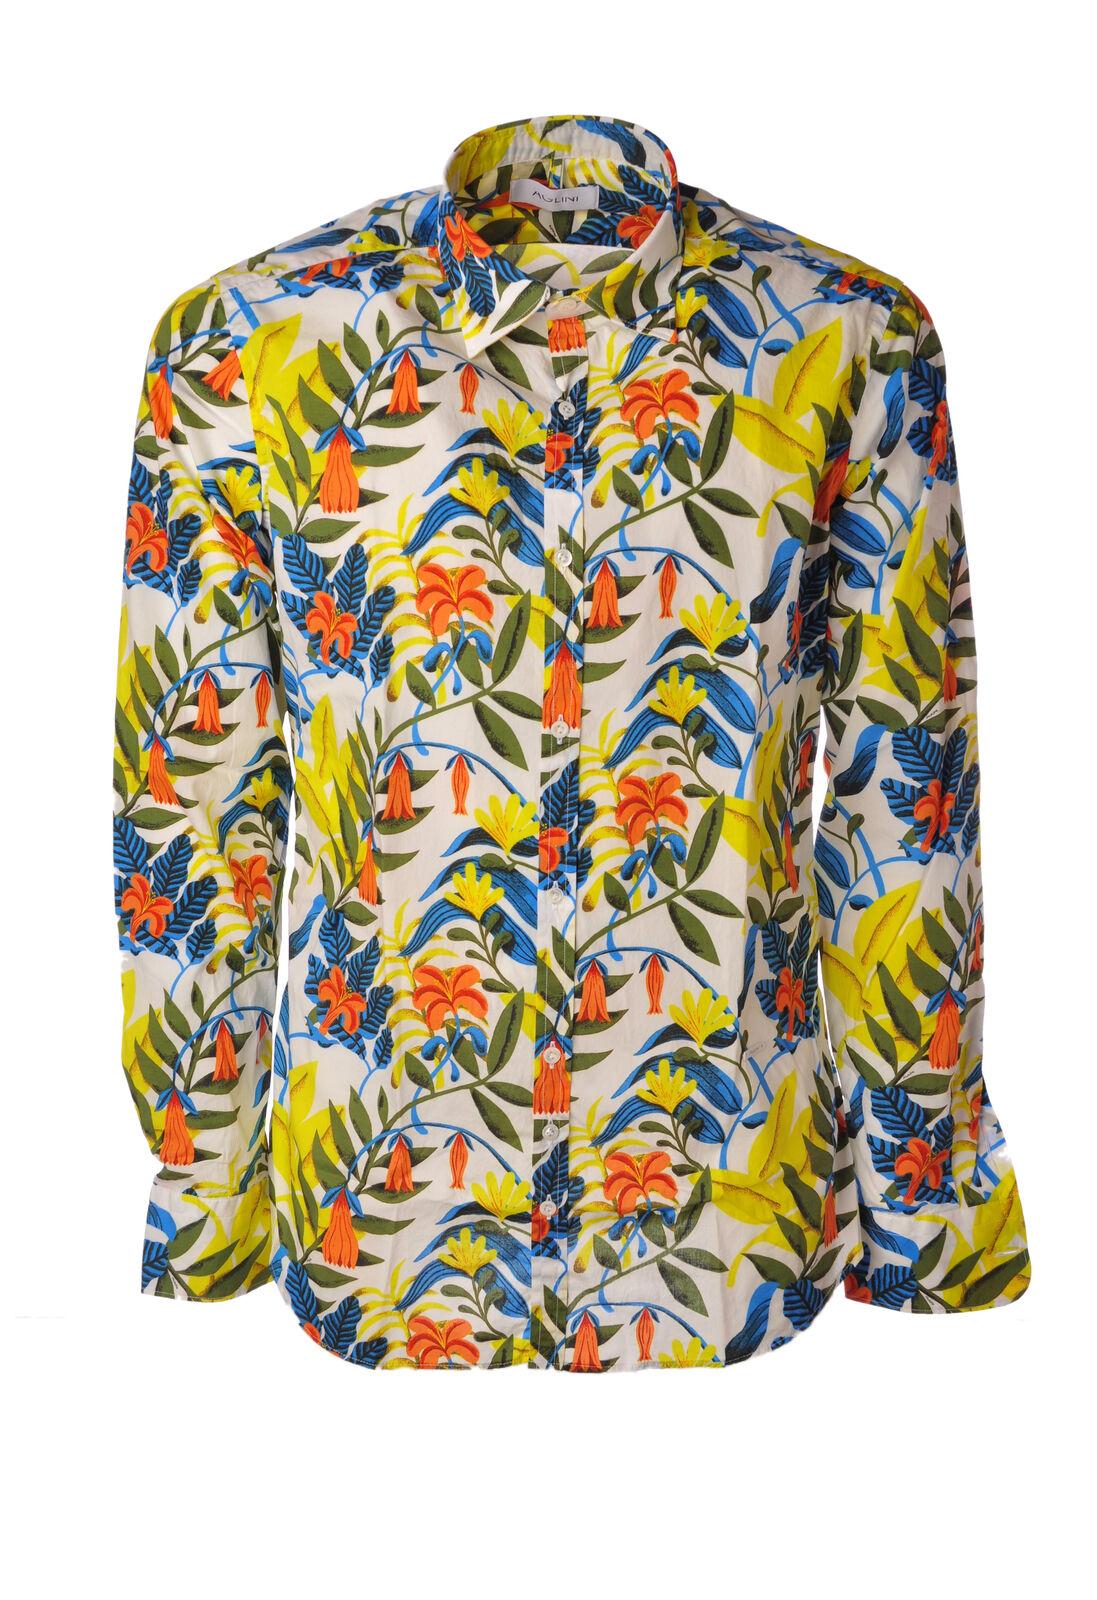 Aglini - bluesen-Shirt - Mann - Fantasie - 4997205G183935